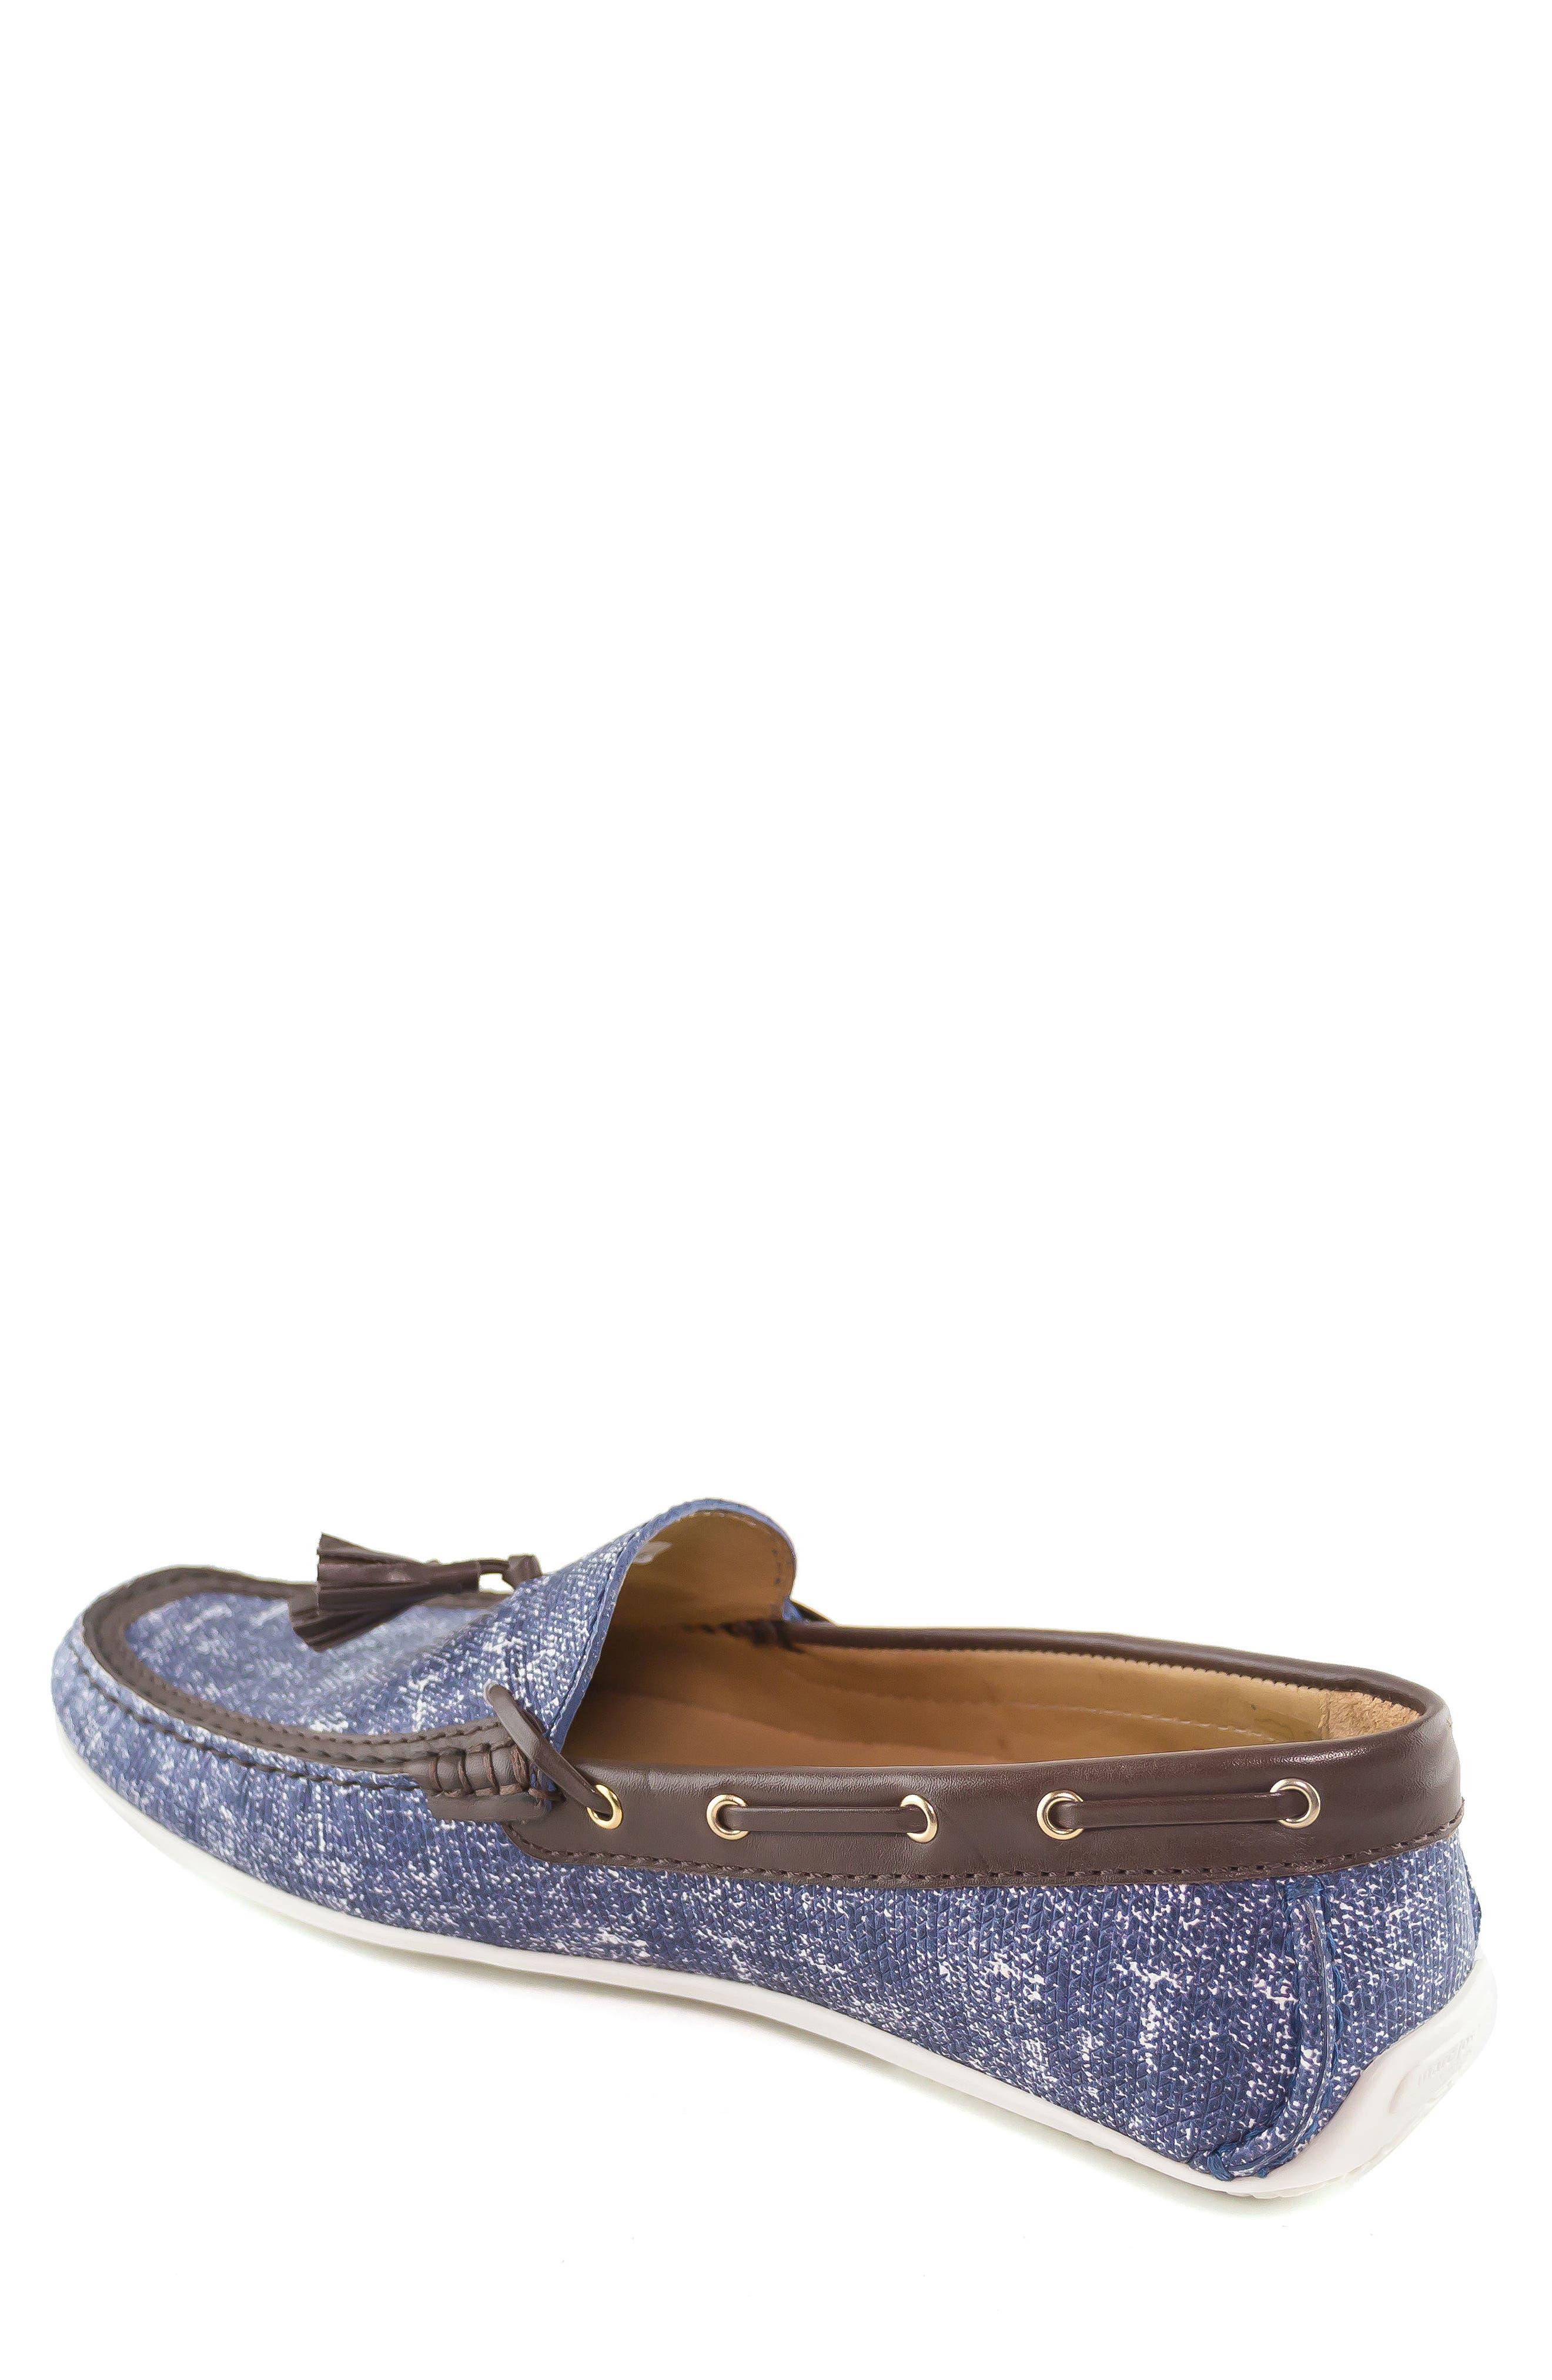 Bushwick Tasseled Driving Loafer,                             Alternate thumbnail 2, color,                             Jeans Blue